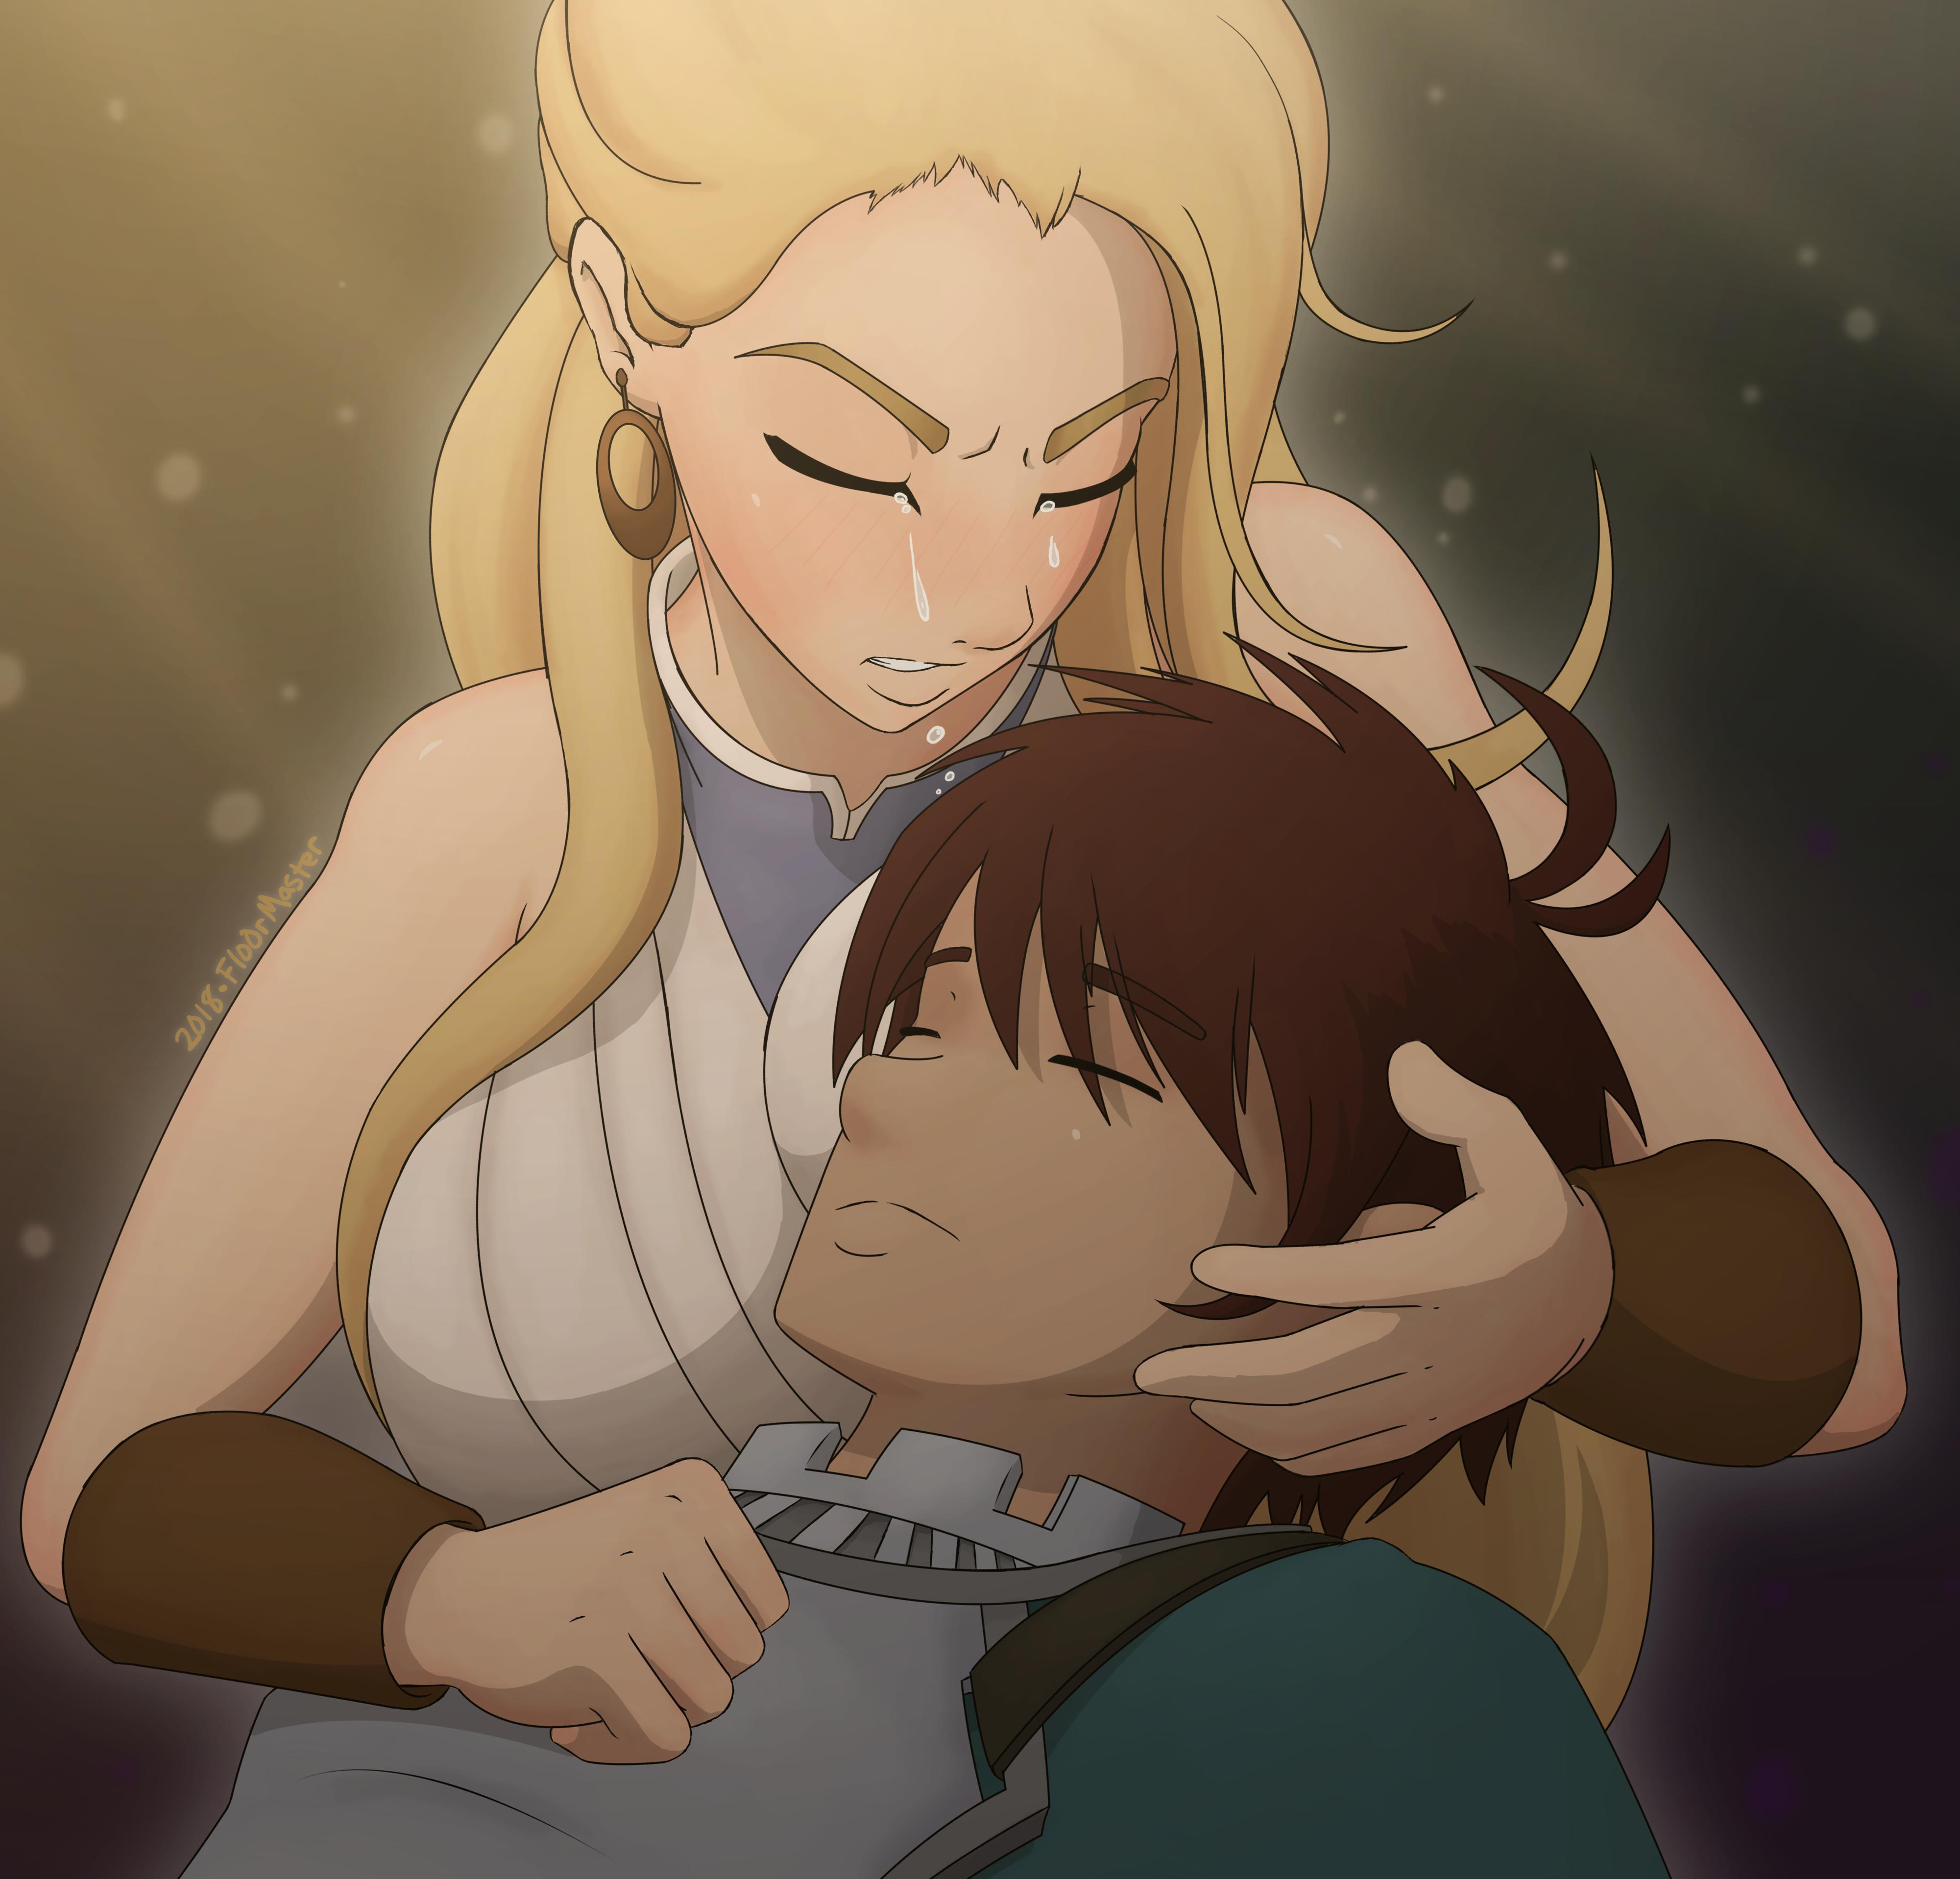 Salem and Ozma